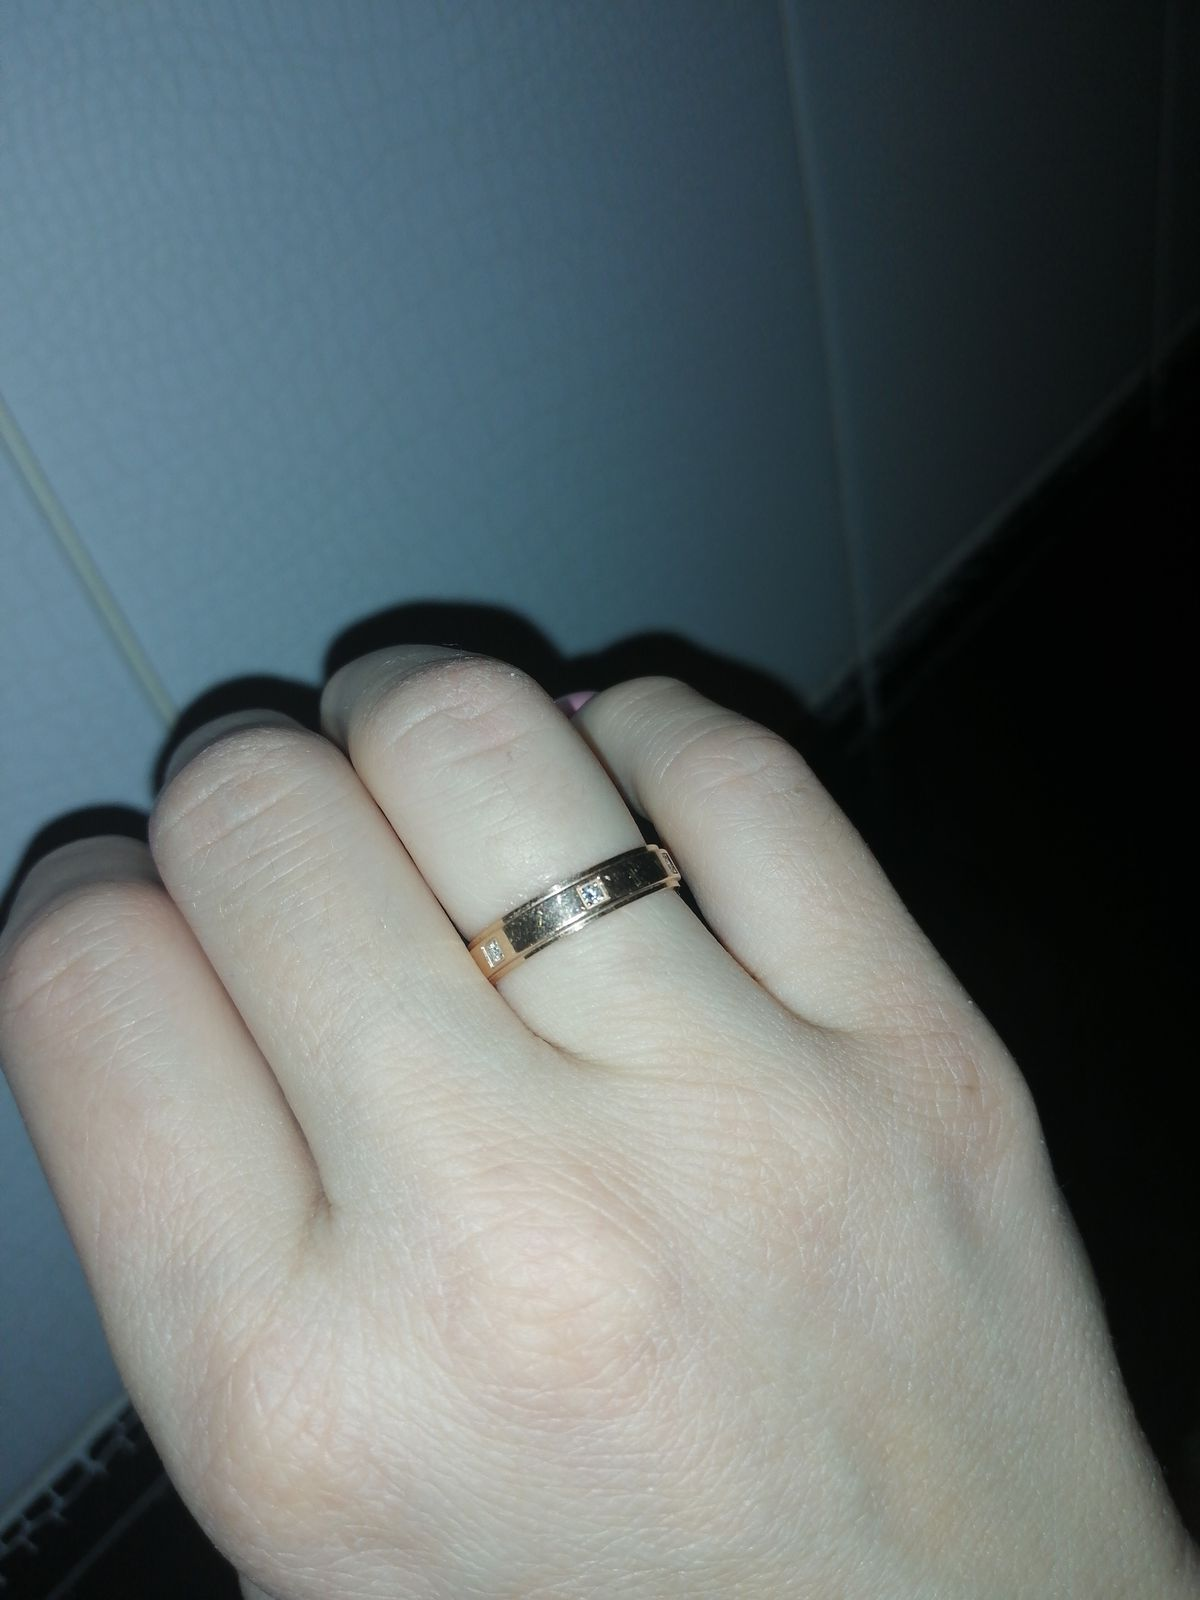 Кольцо с шестью бриллиантами